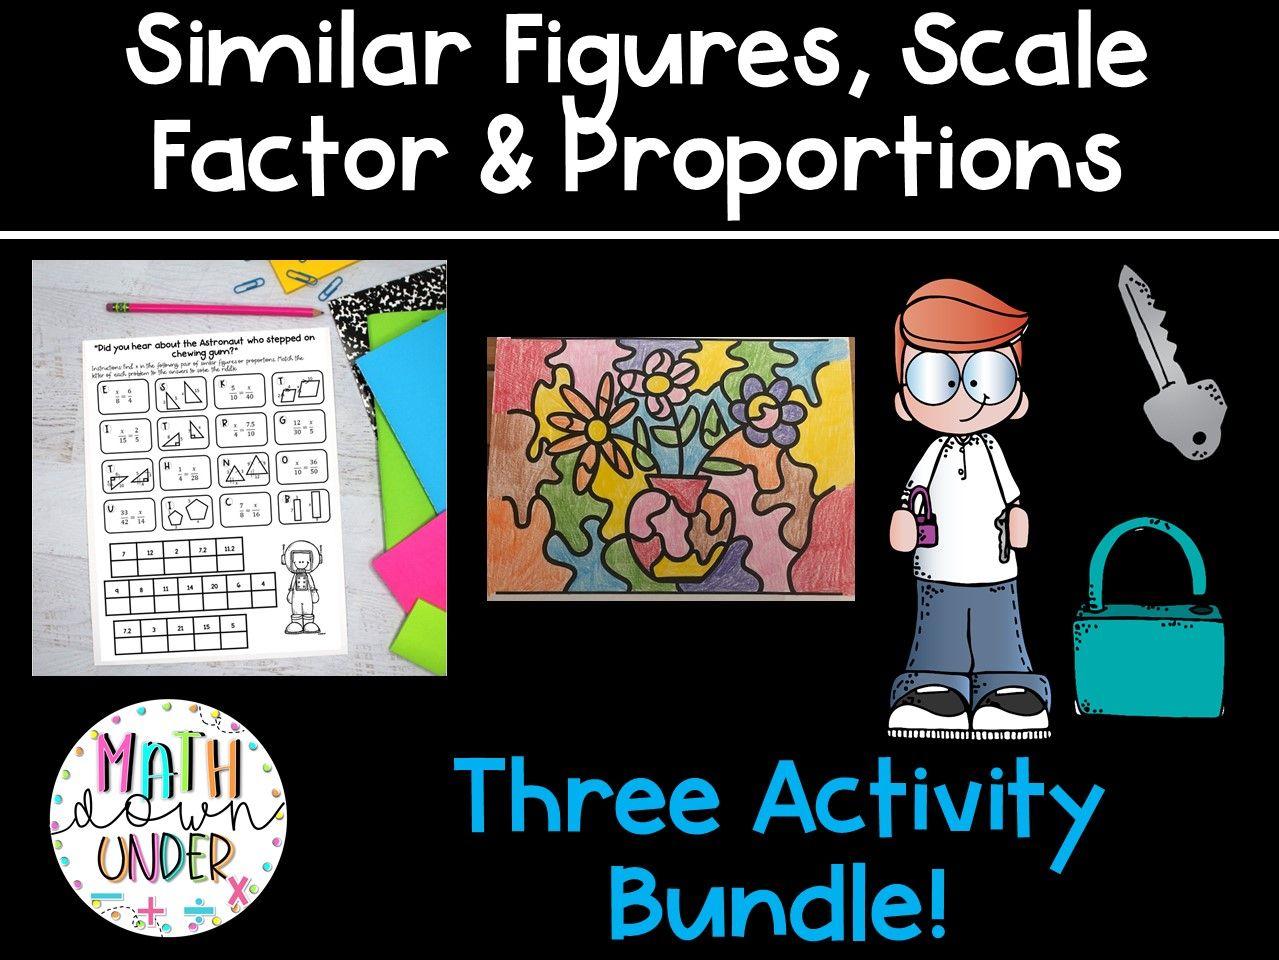 Similar Figures, Scale Factor, & Proportions Activity Bundle! 3 Math Activities